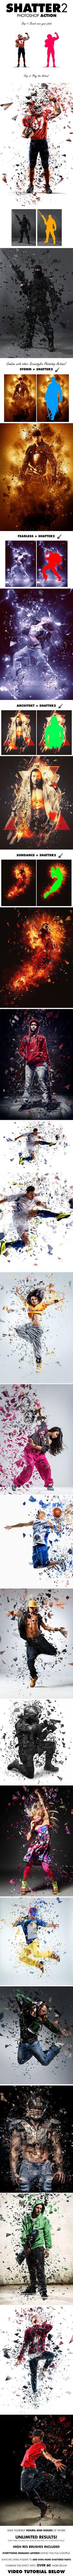 Shatter2 Photoshop Action #photoeffect Download: http://graphicriver.net/item/shatter2-photoshop-action/13001535?ref=ksioks